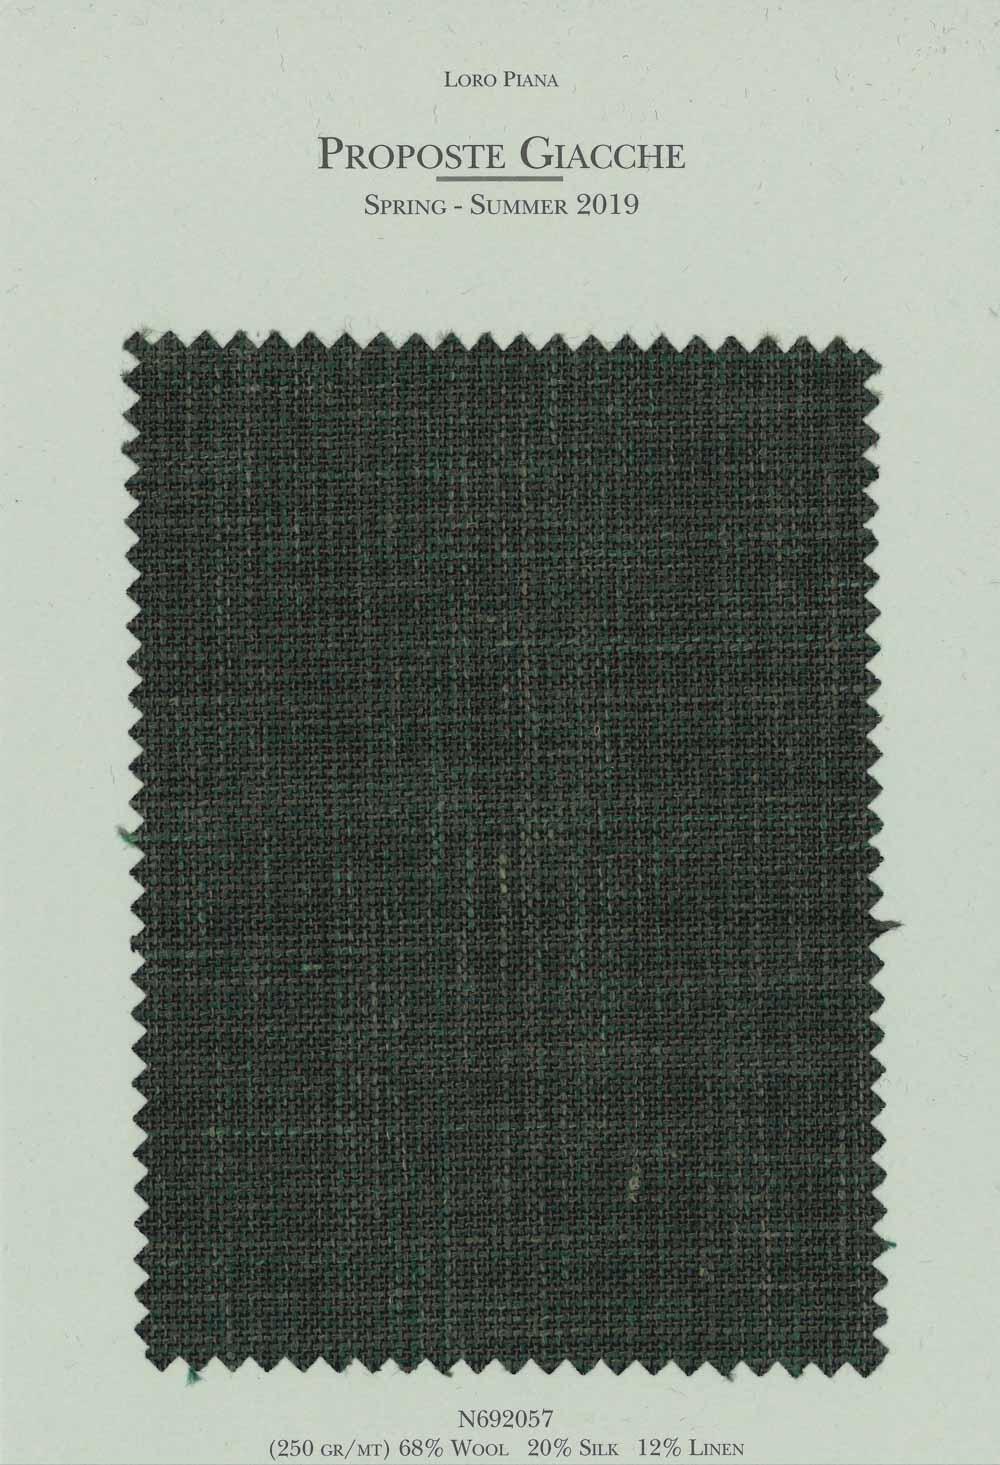 N692057